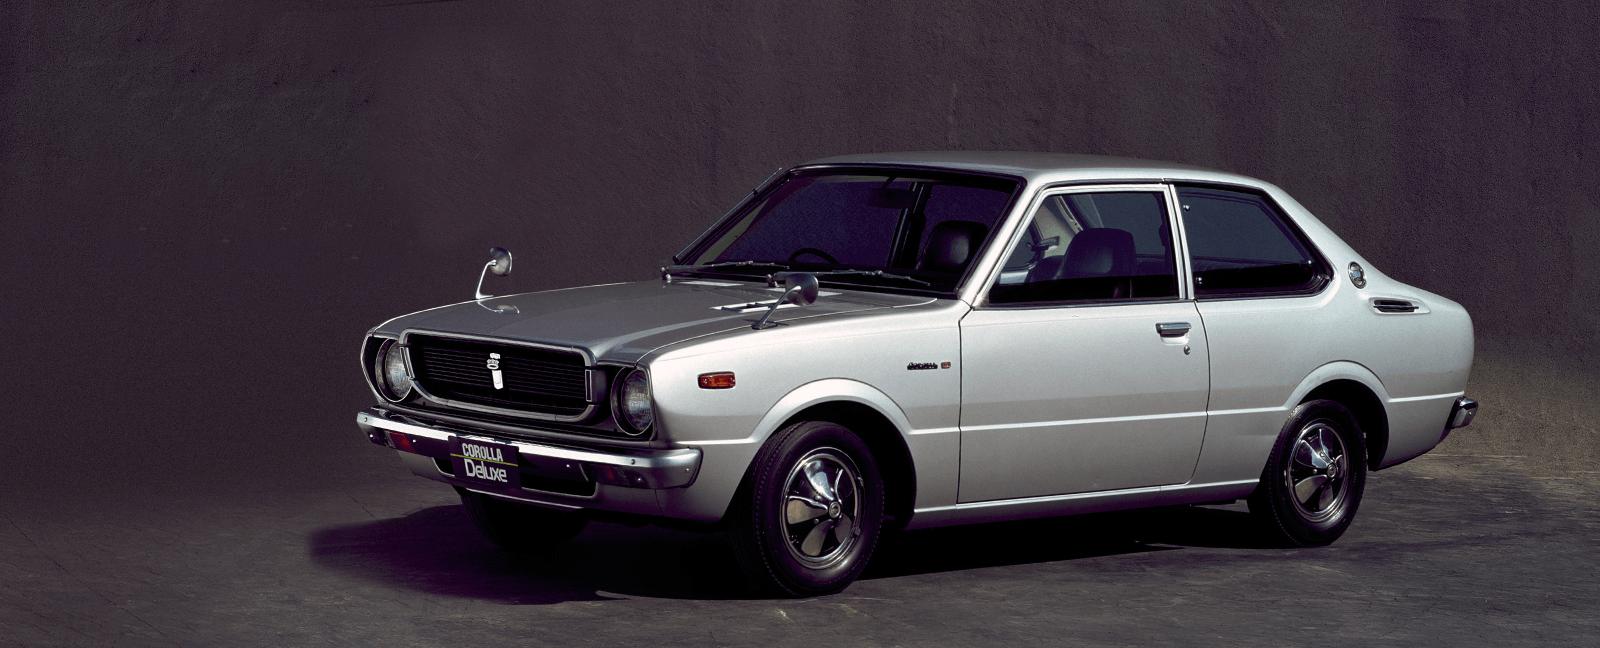 Toyota Corolla III (E30, E40, E50, E60) 1974 - 1979 Coupe #3